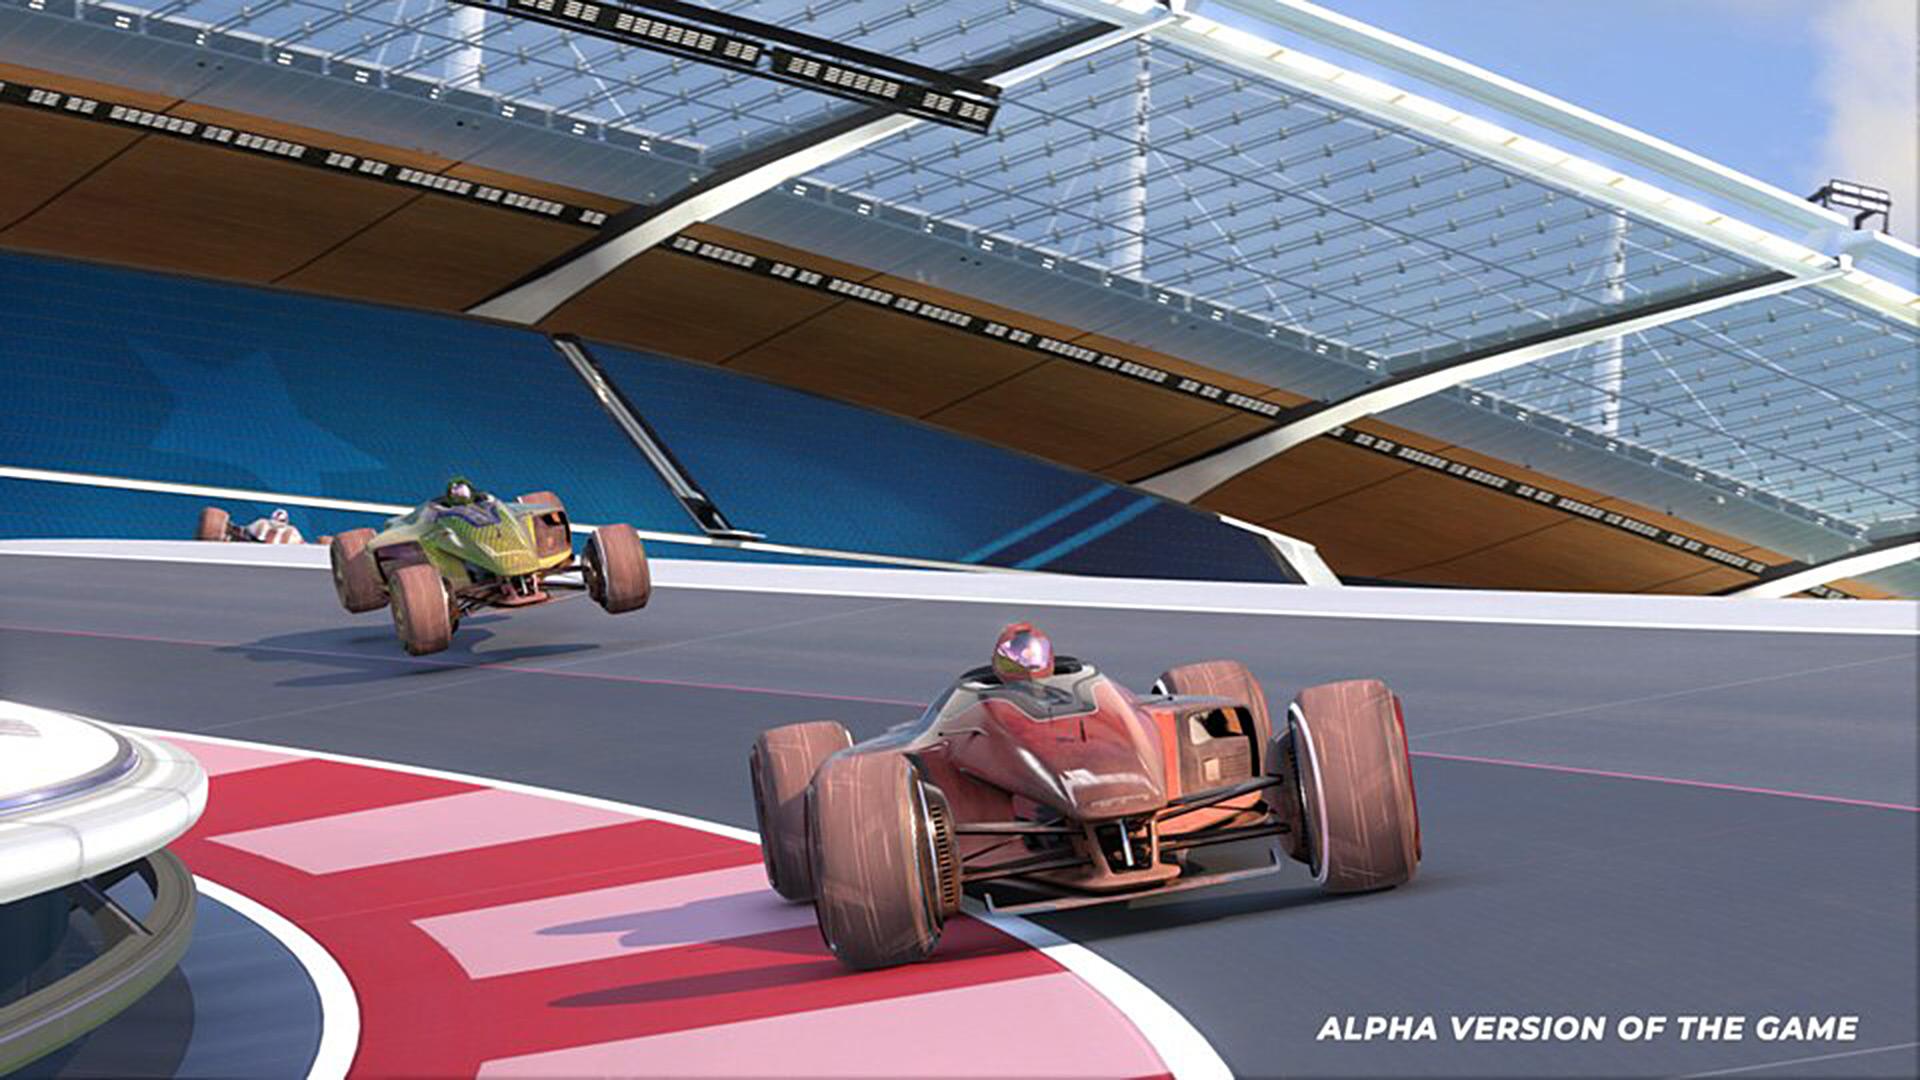 Quelle: Ubisoft Nadeo - Trackmania (Remake) - Neues Fahrzeugdesign